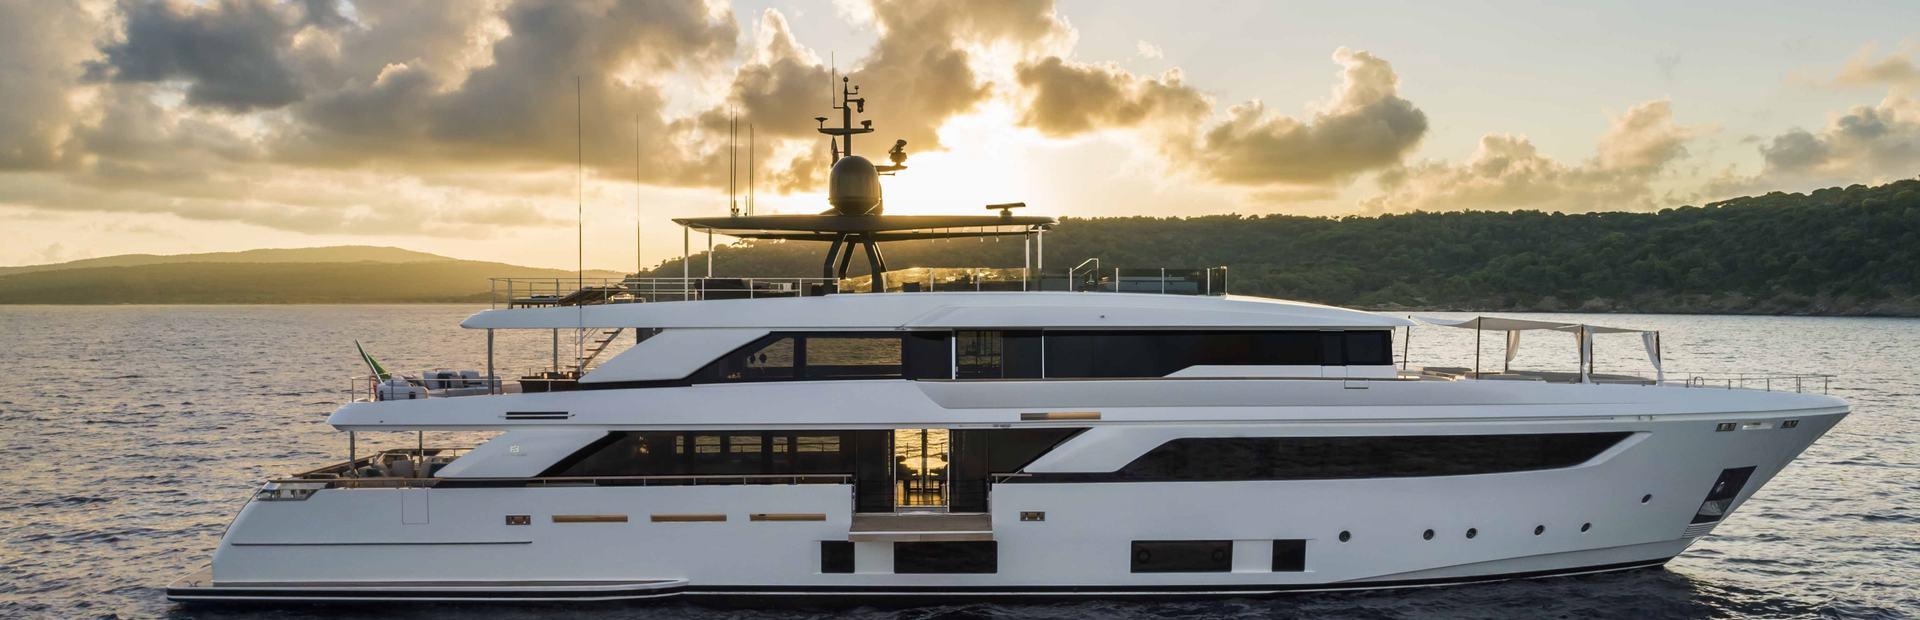 Navetta 42 Yacht Charter